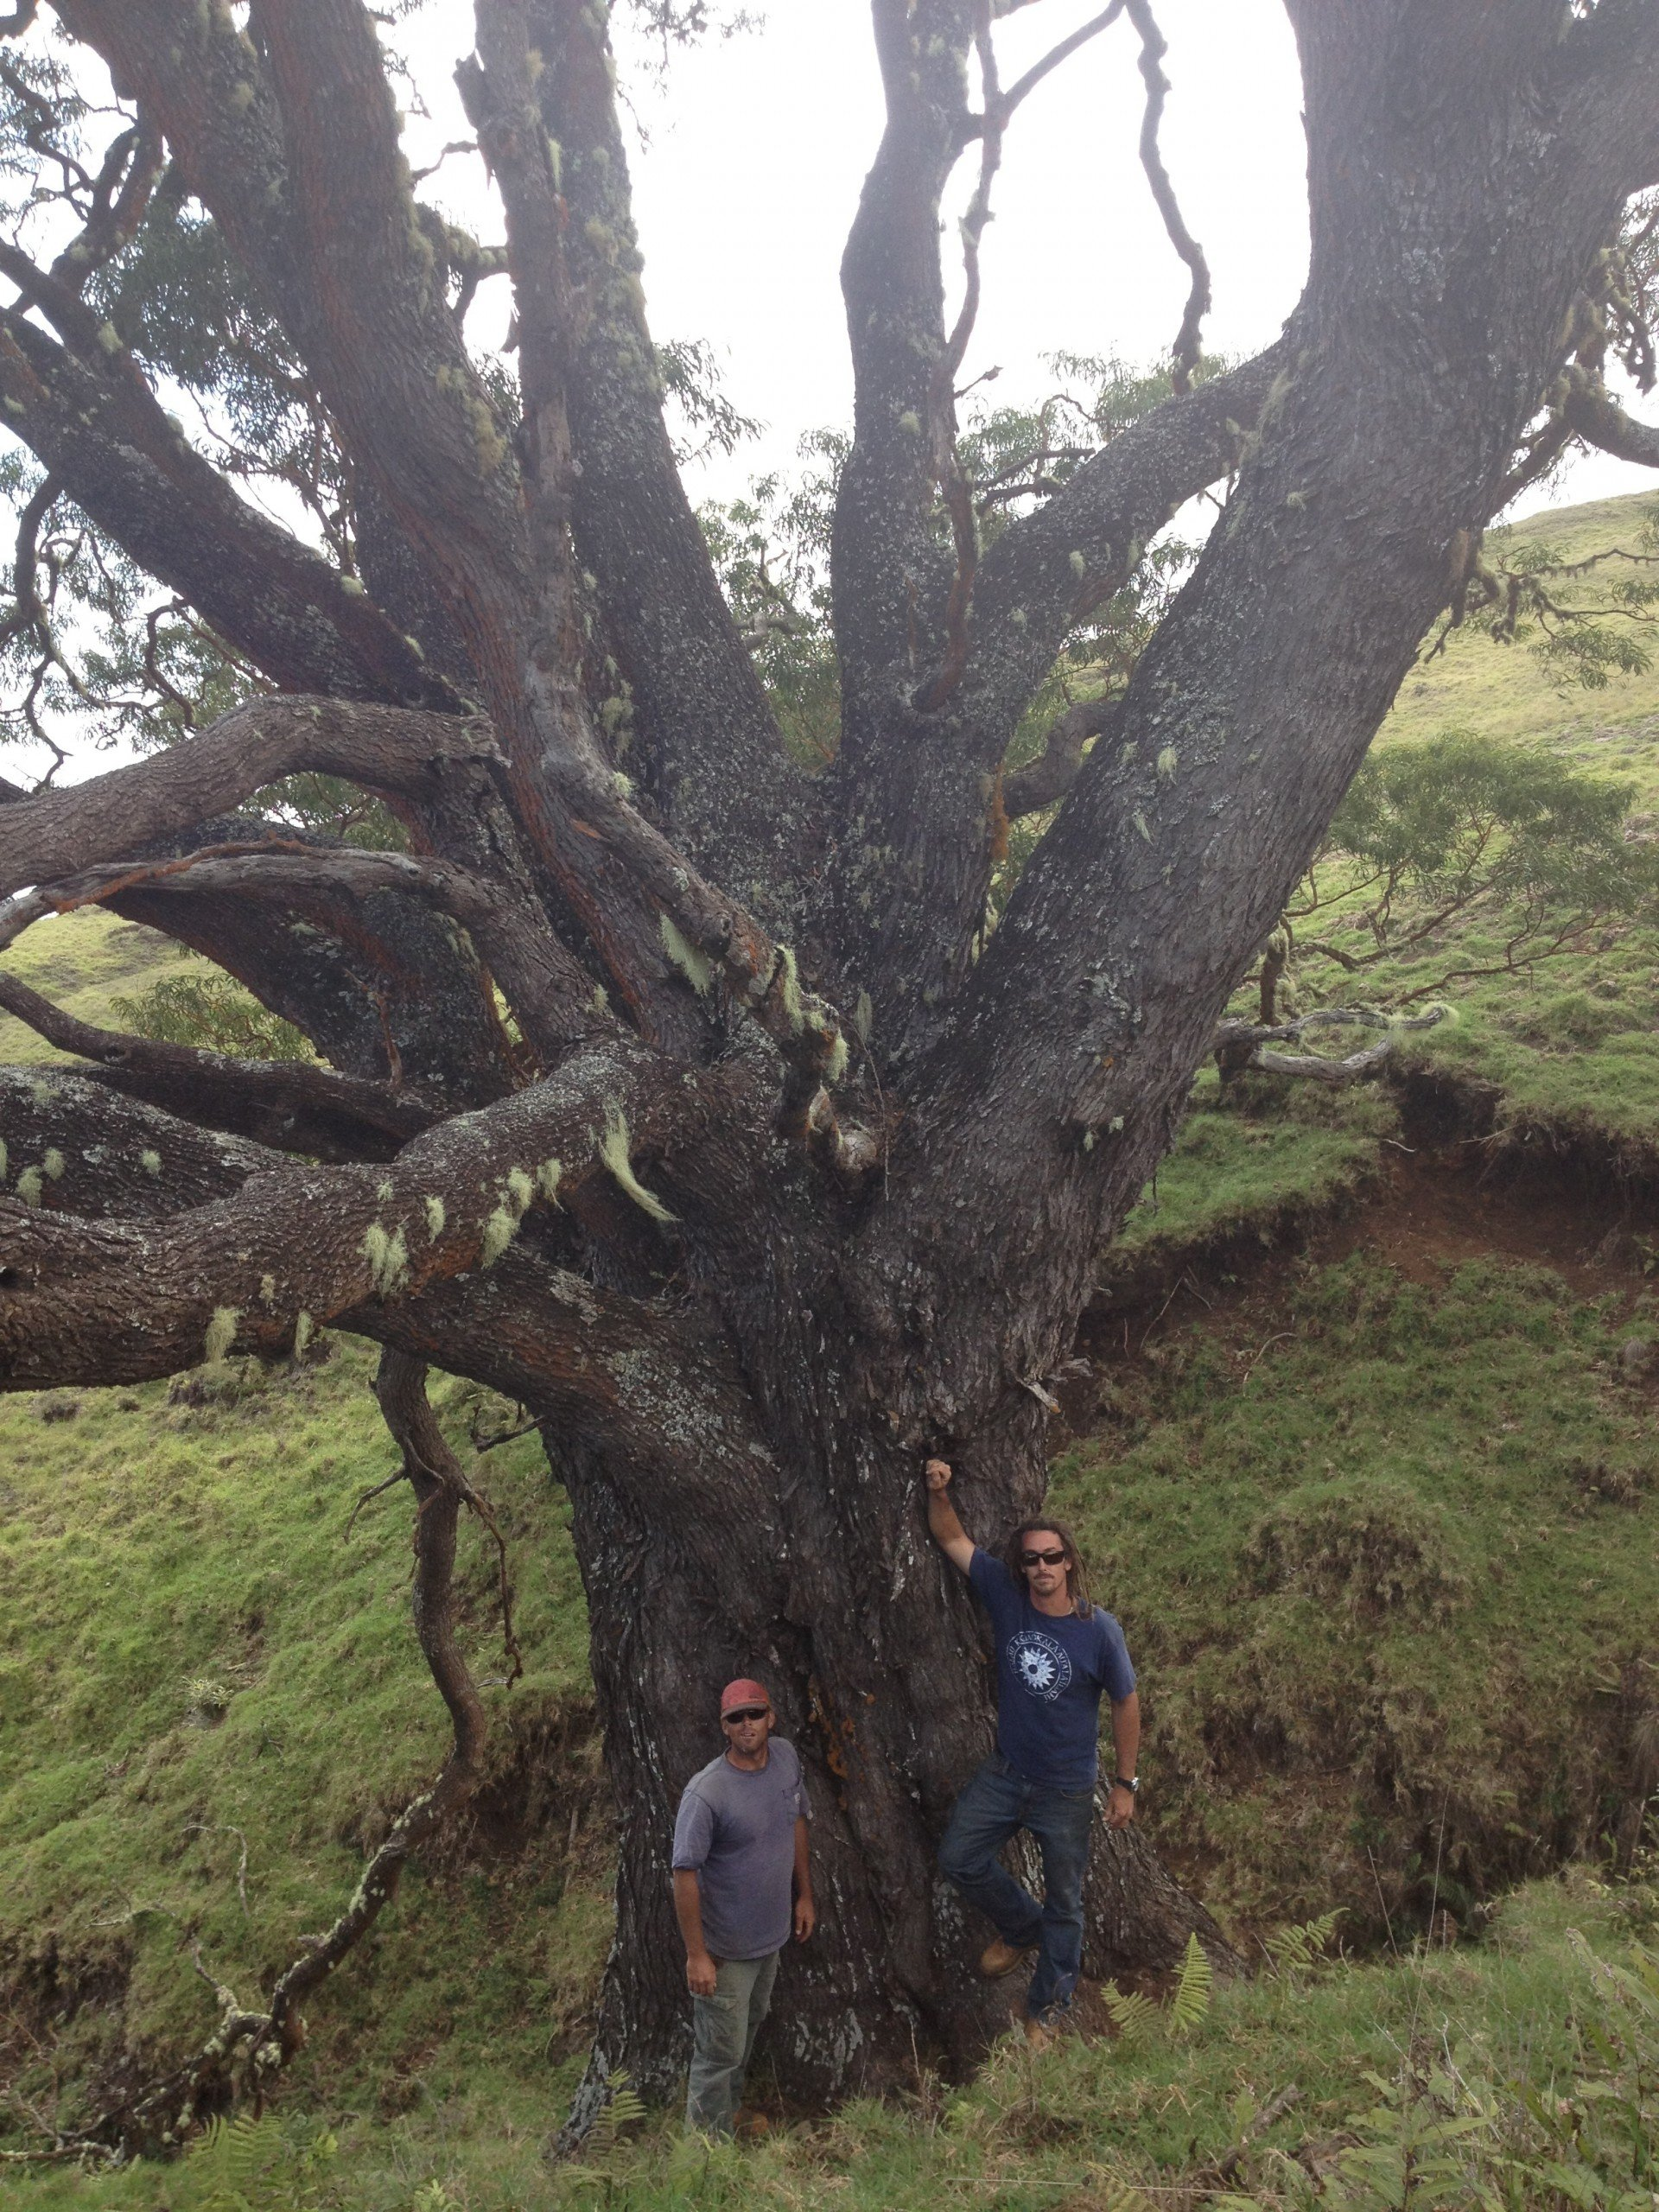 The partners at a koa tree in the Kahikinui Forest Reserve, which is on the south slope of Haleakala. Photo: Courtesy Christine Waara